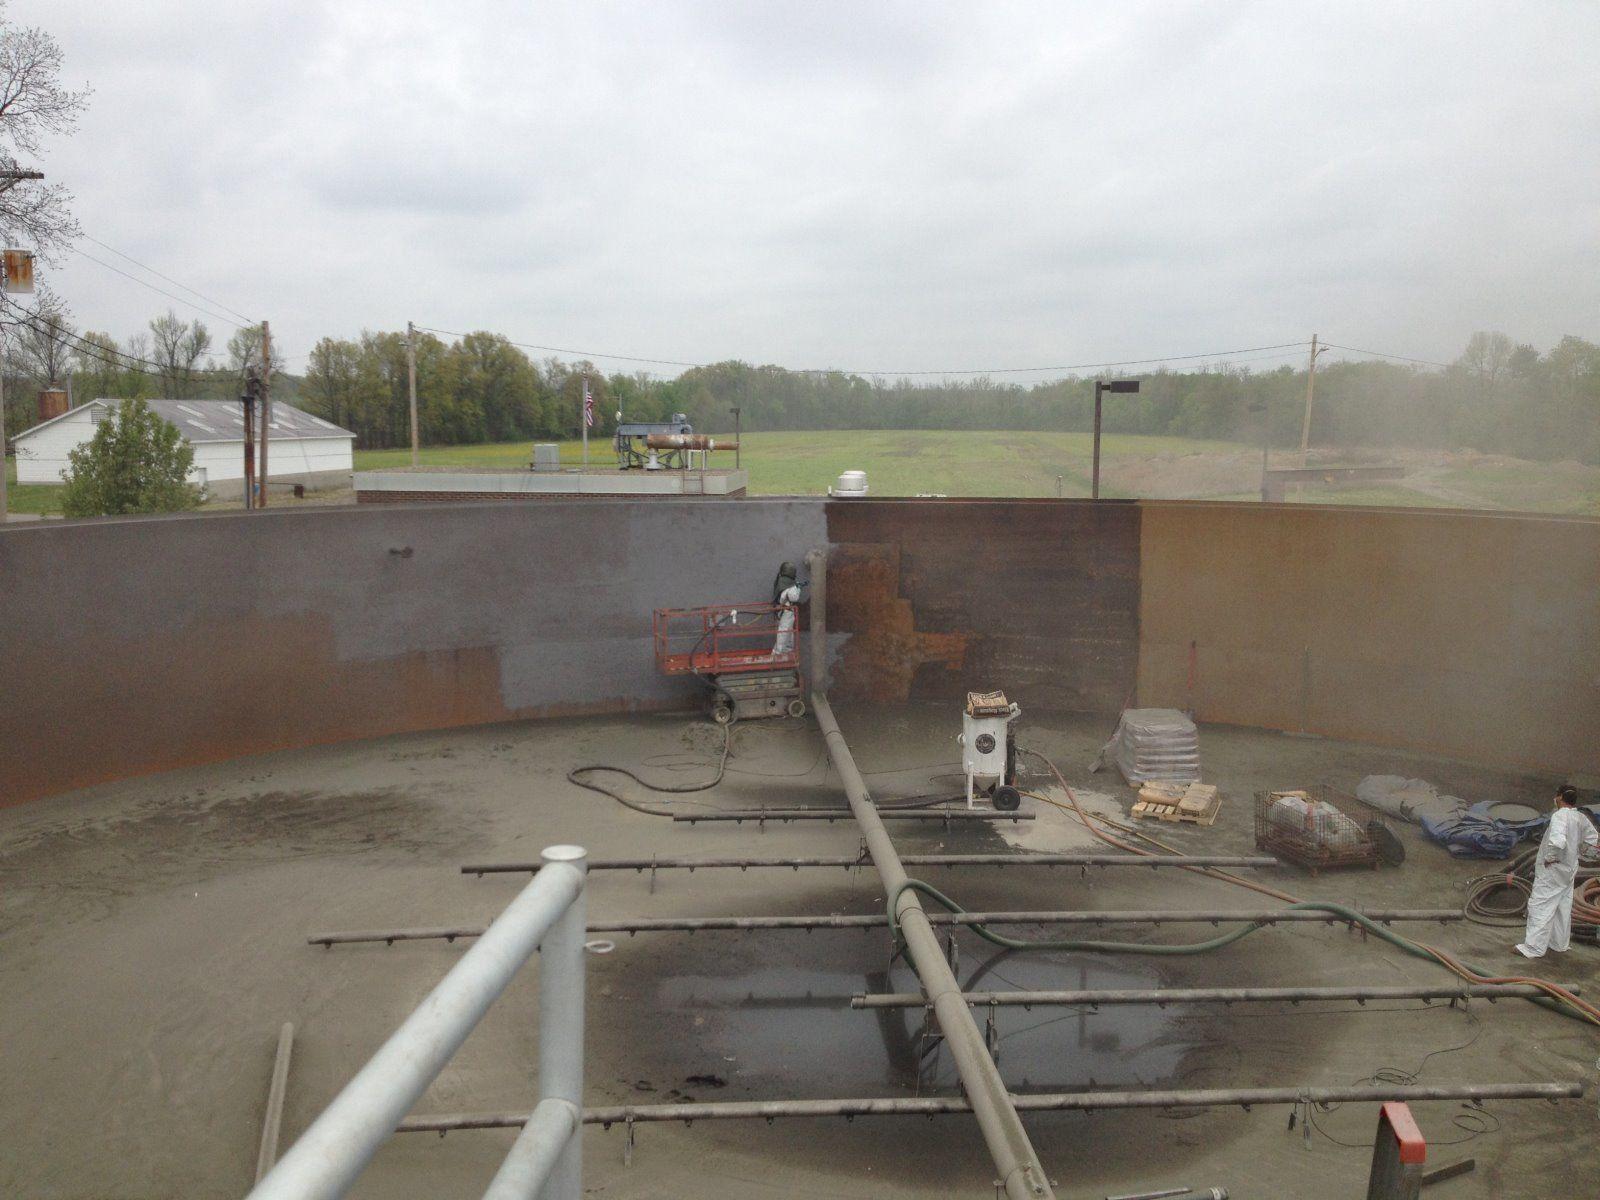 Waste Water Treatment Tank - Scottsburg, Indiana - Sandblasting 500,000 Gallons - Abrasive Blast, Paint Removal, WWPT, Industrial, Stripping